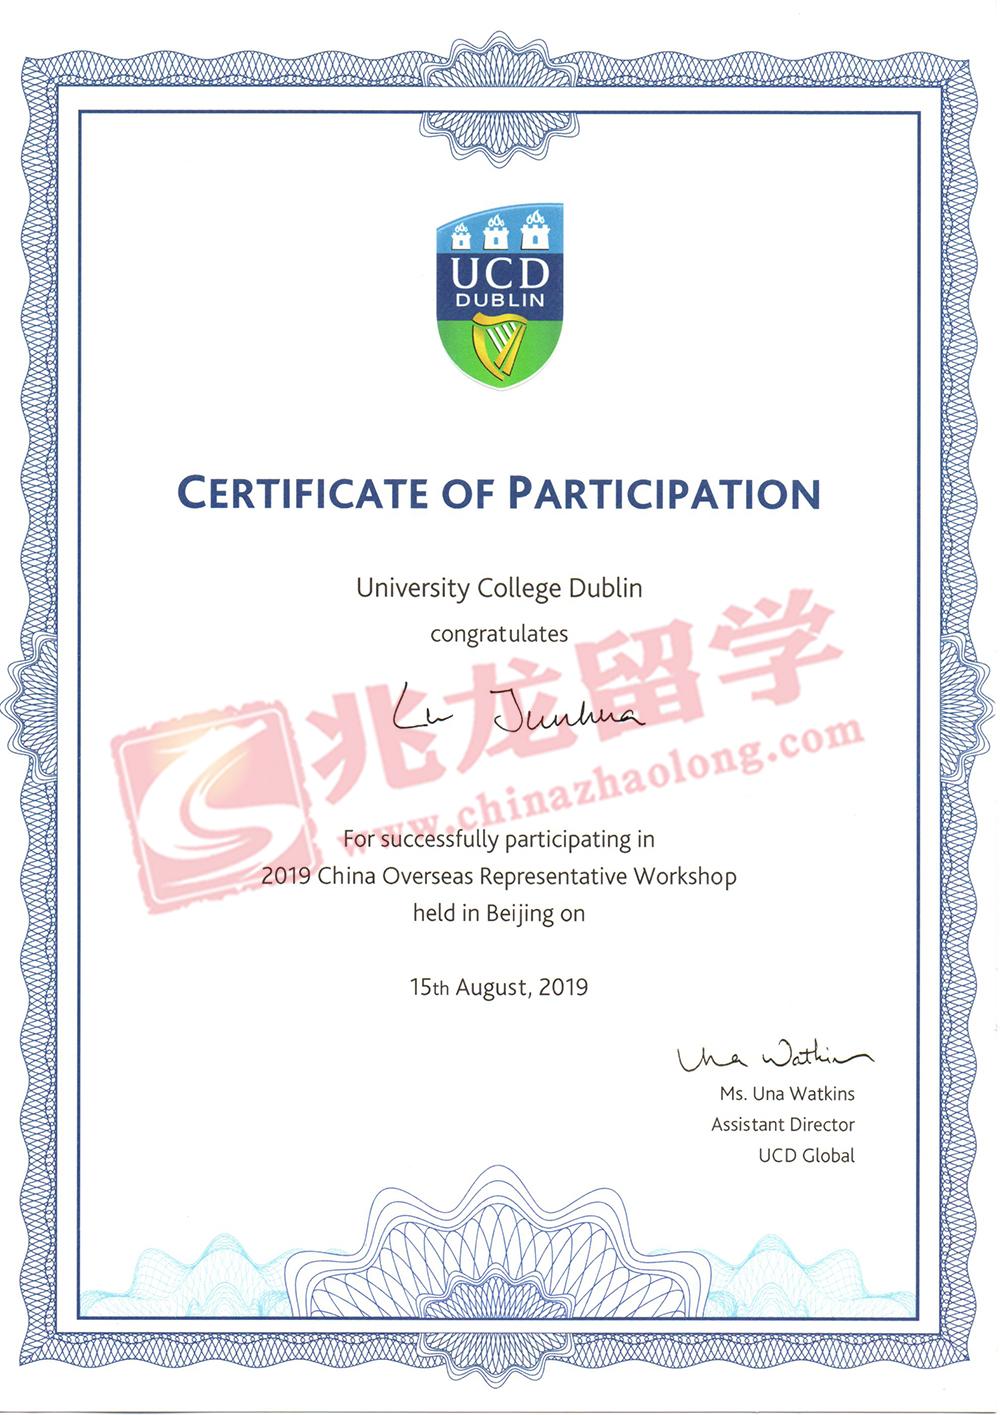 UCD国际部老师给兆龙留学吕老师颁发了证书-吕君华.jpg